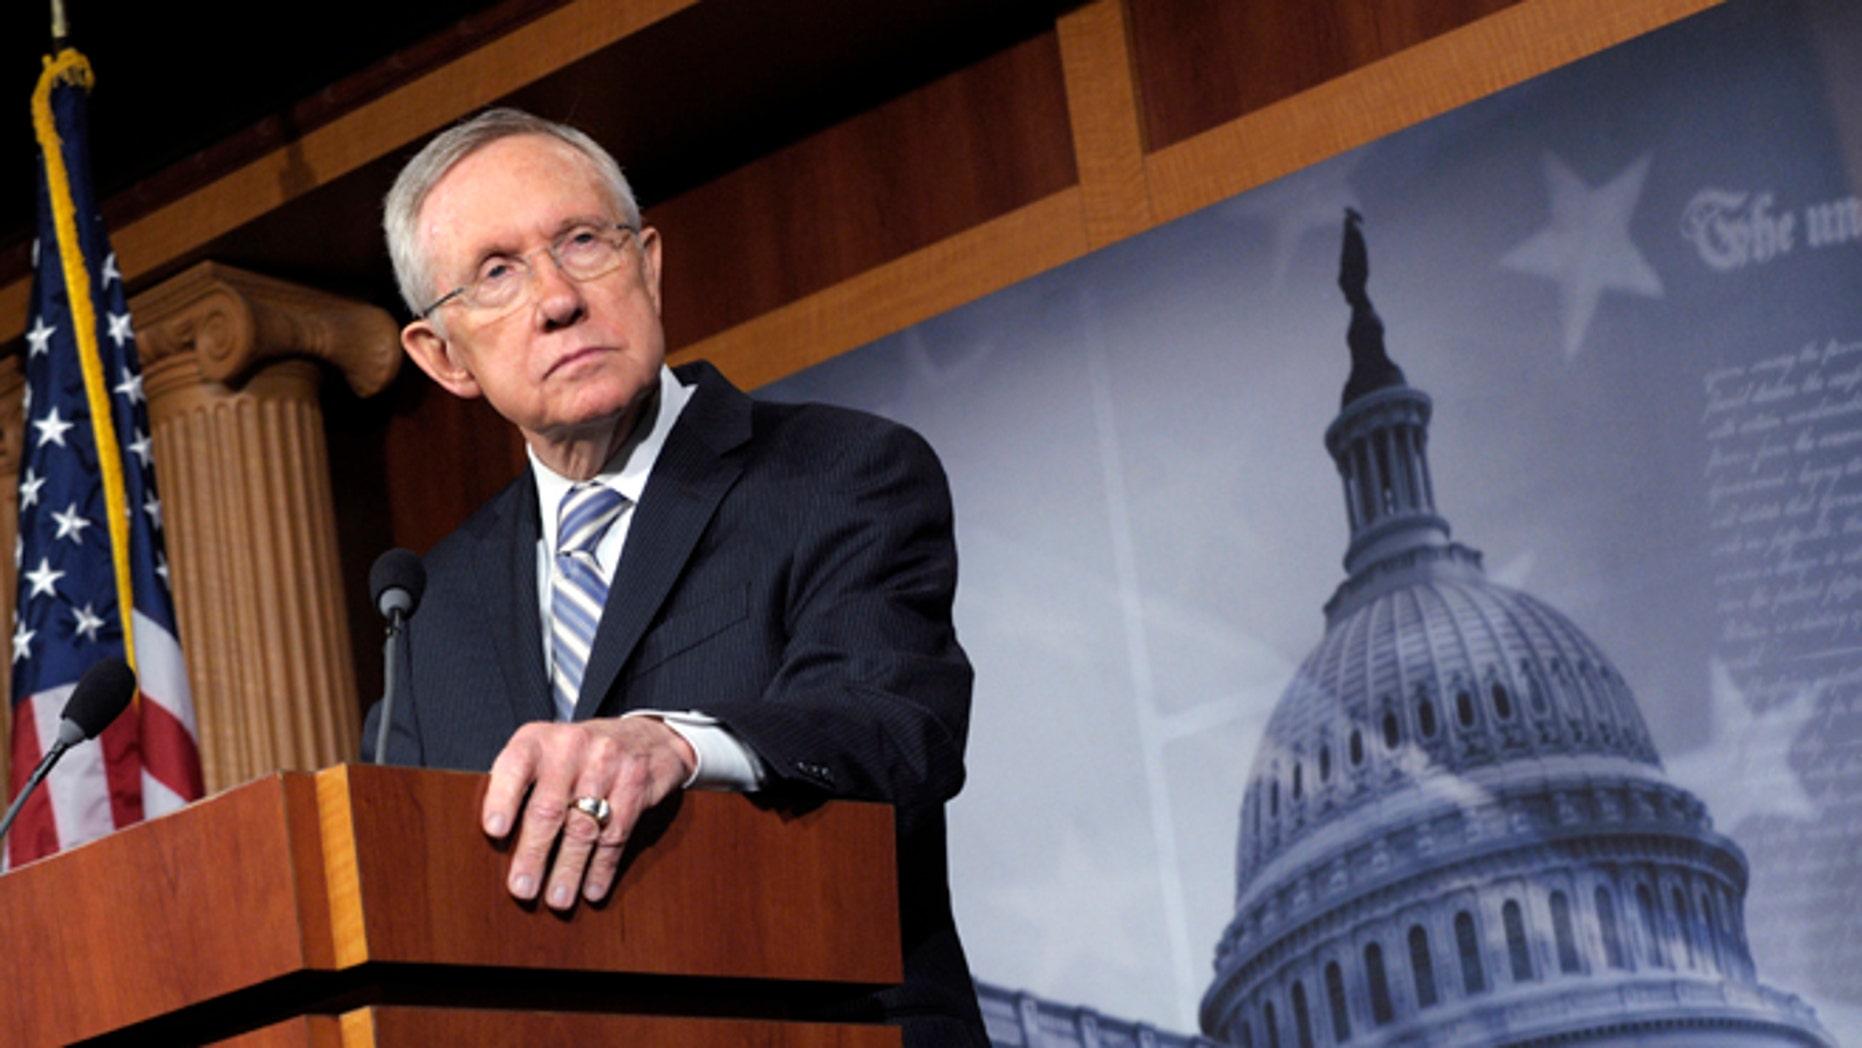 FILE:  Nov. 7, 2012: Senate Majority Leader Harry Reid on Capitol Hill in Washington, D.C.